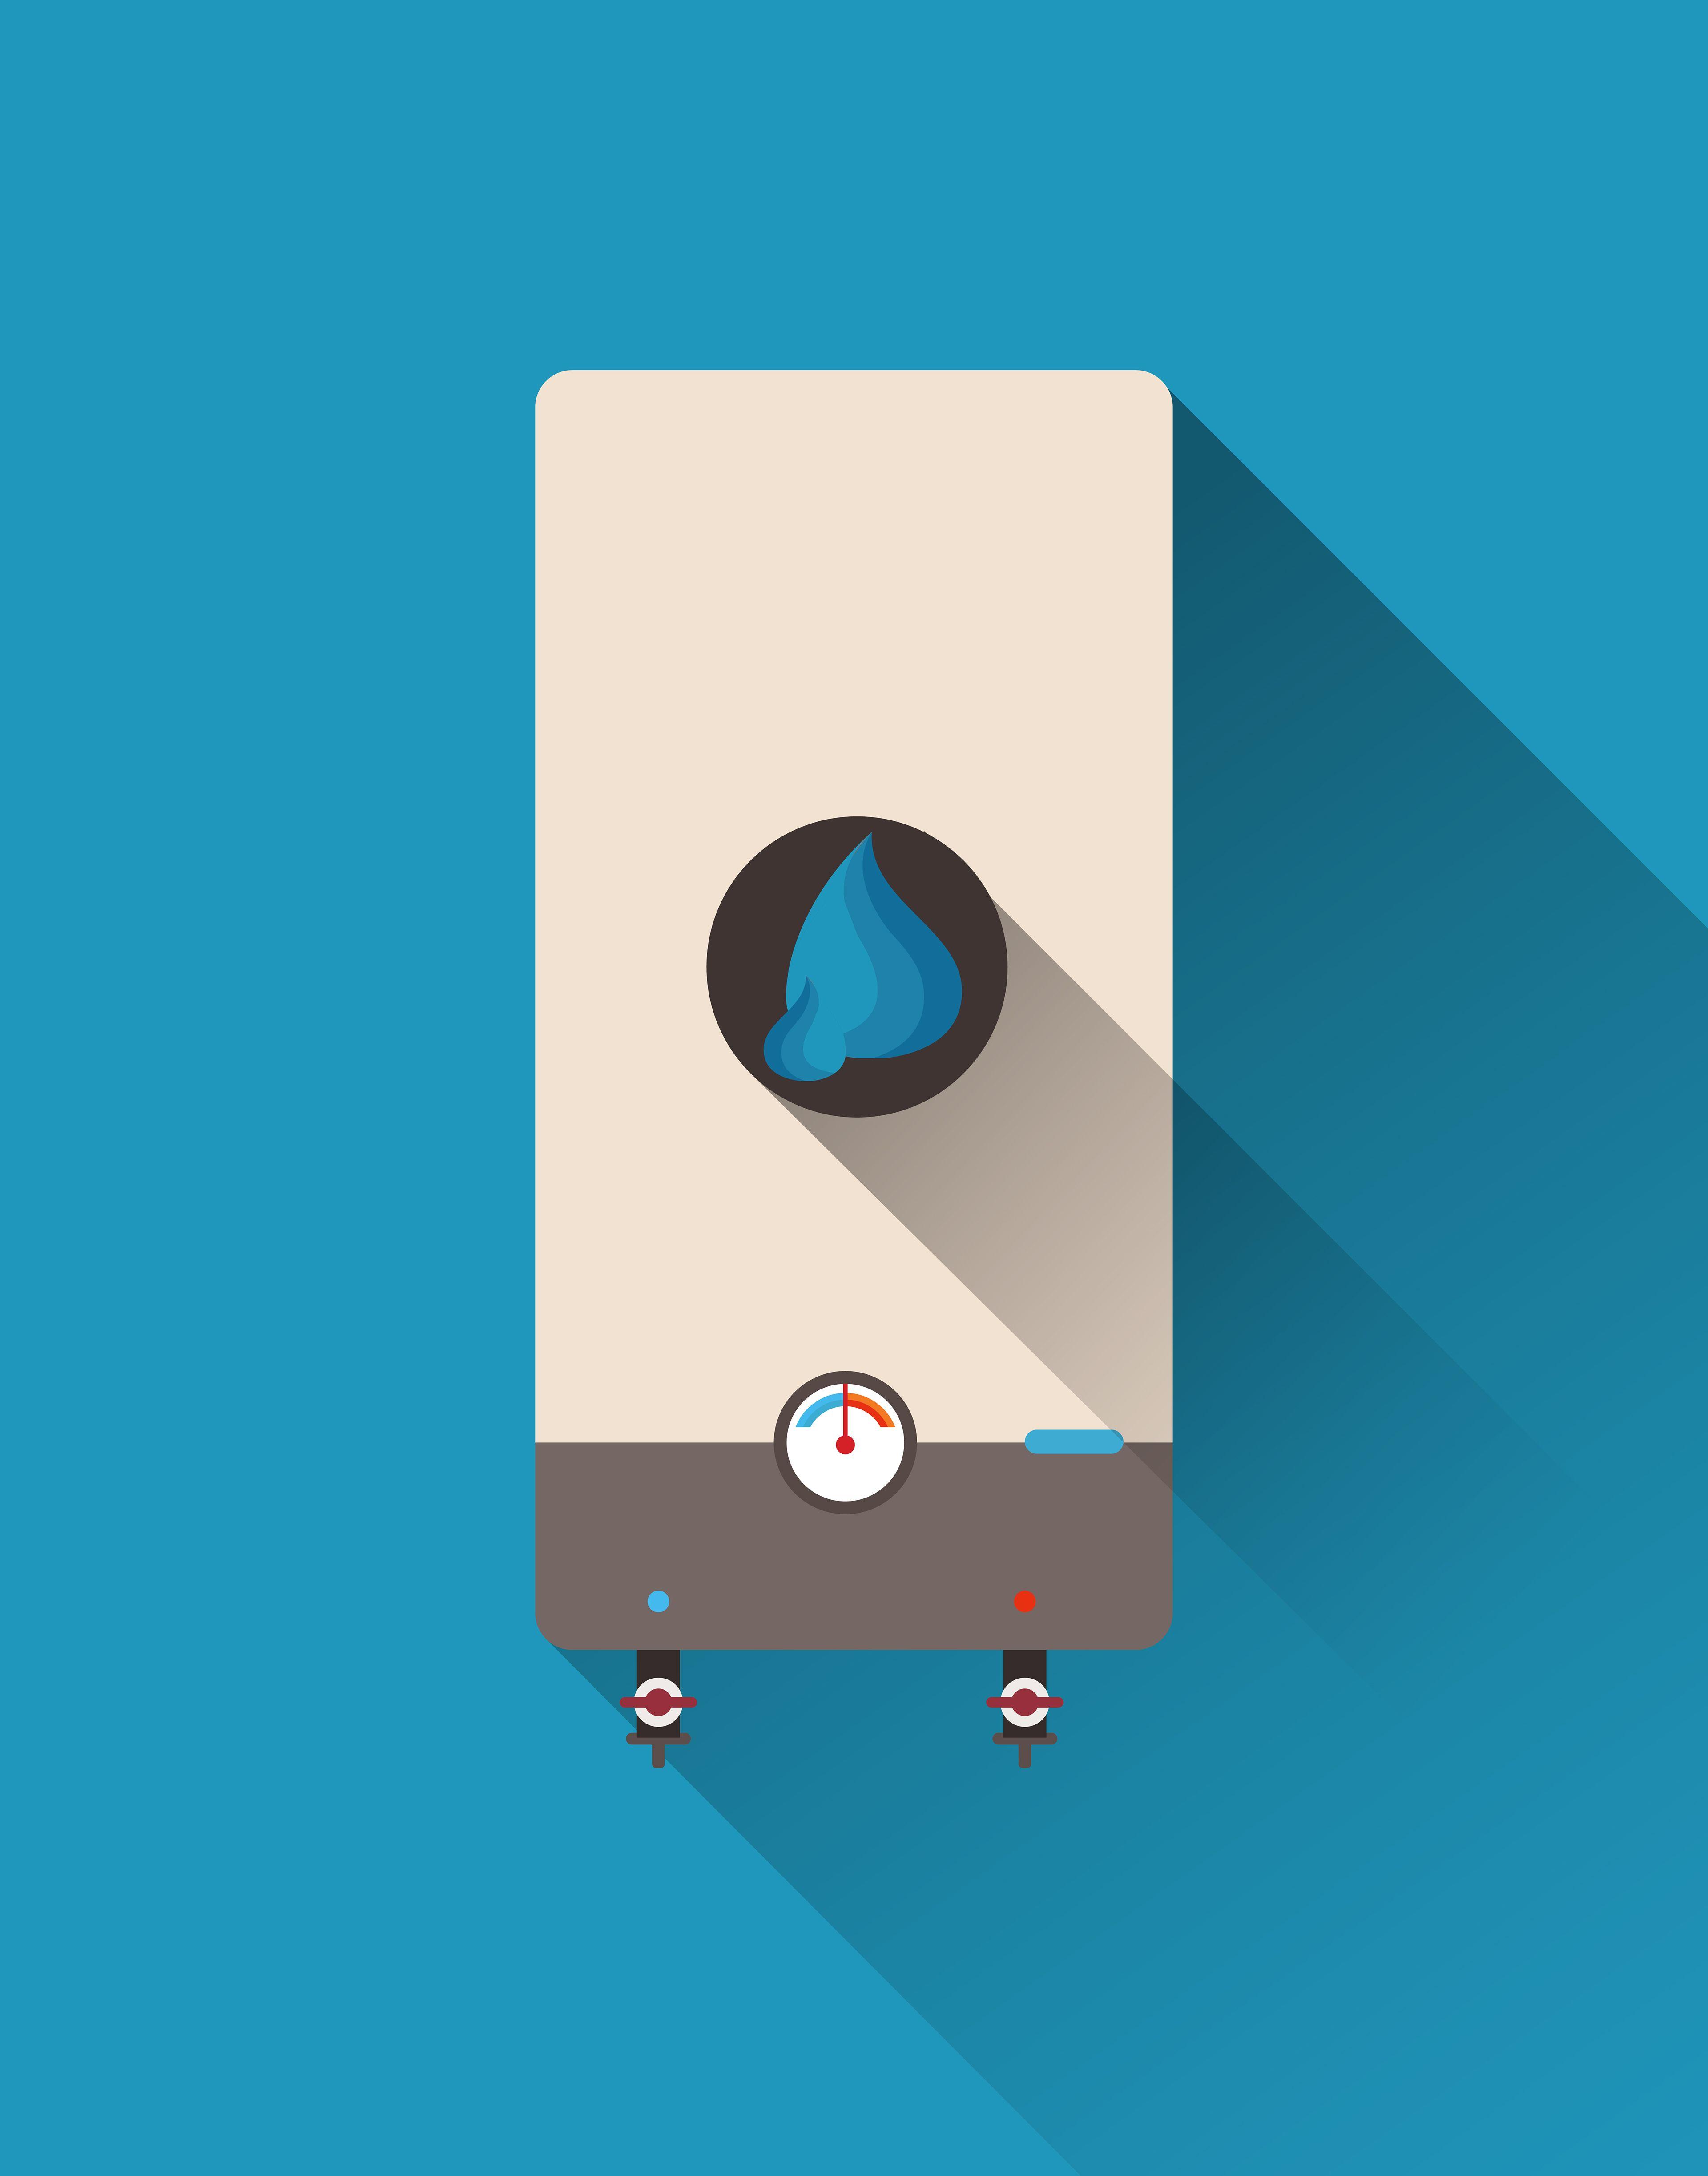 Gas boiler | Inspiration | Pinterest | Gas boiler and Late work